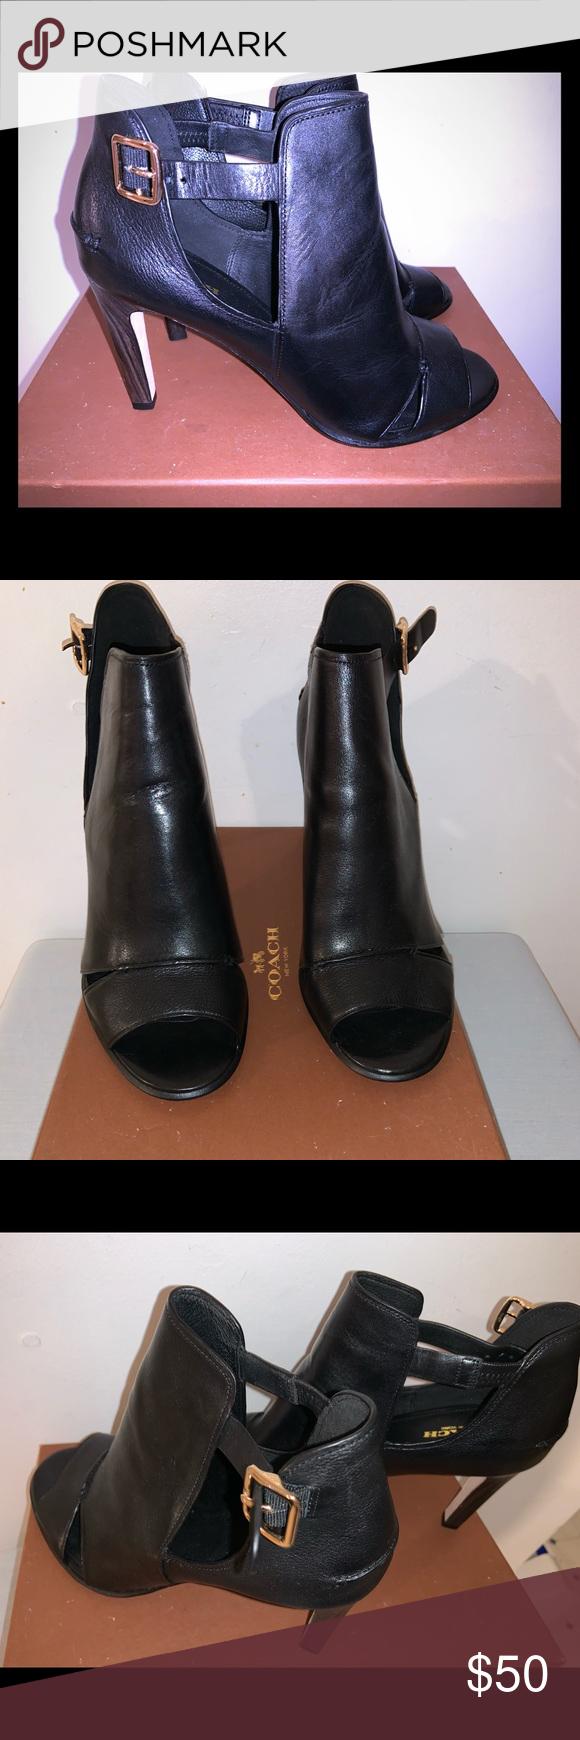 black peep toe booties size 11